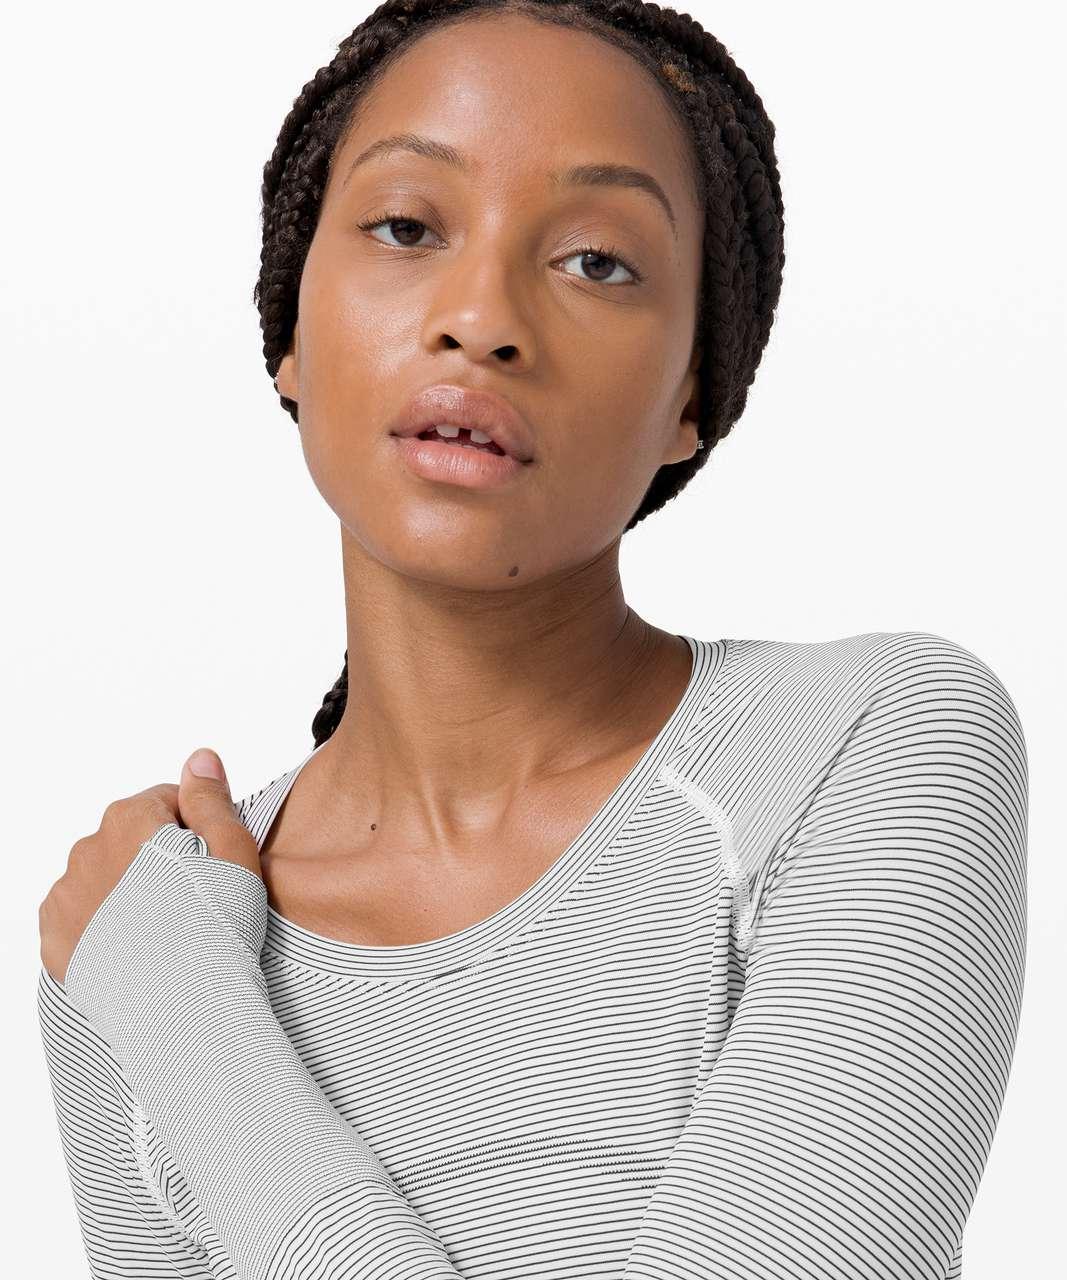 Lululemon Swiftly Tech Long Sleeve 2.0 - Tempo Stripe White / Black